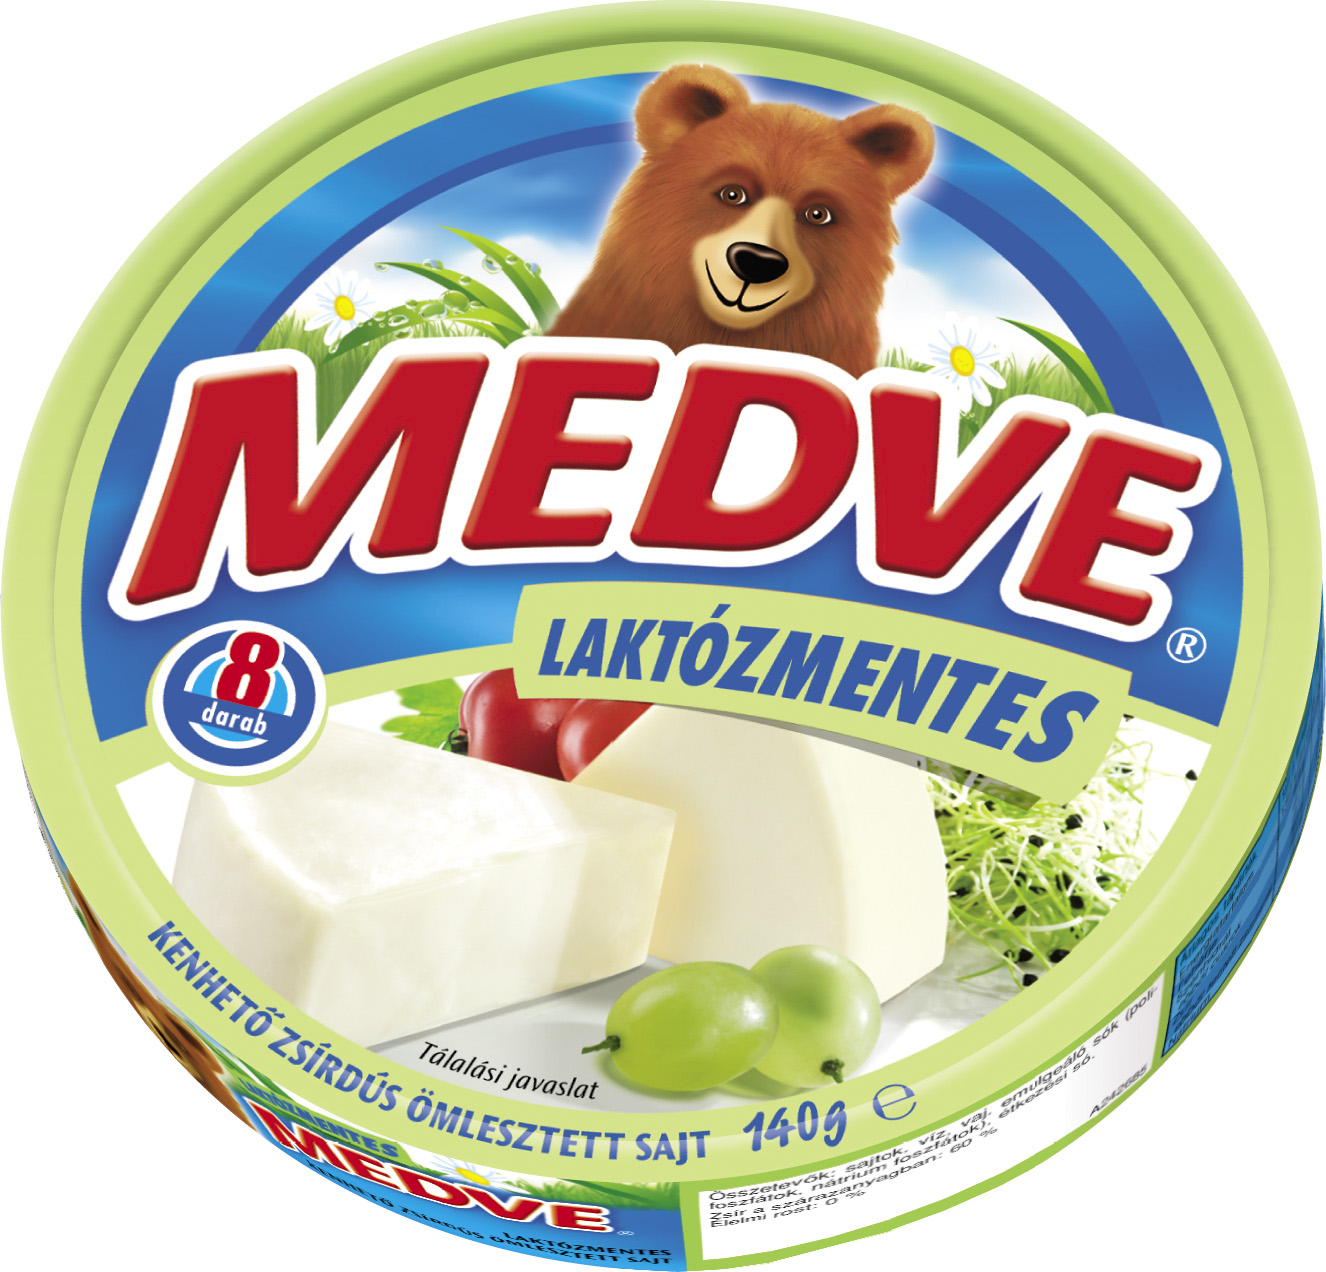 Medve Kordobozos laktozmentes sajt 140g